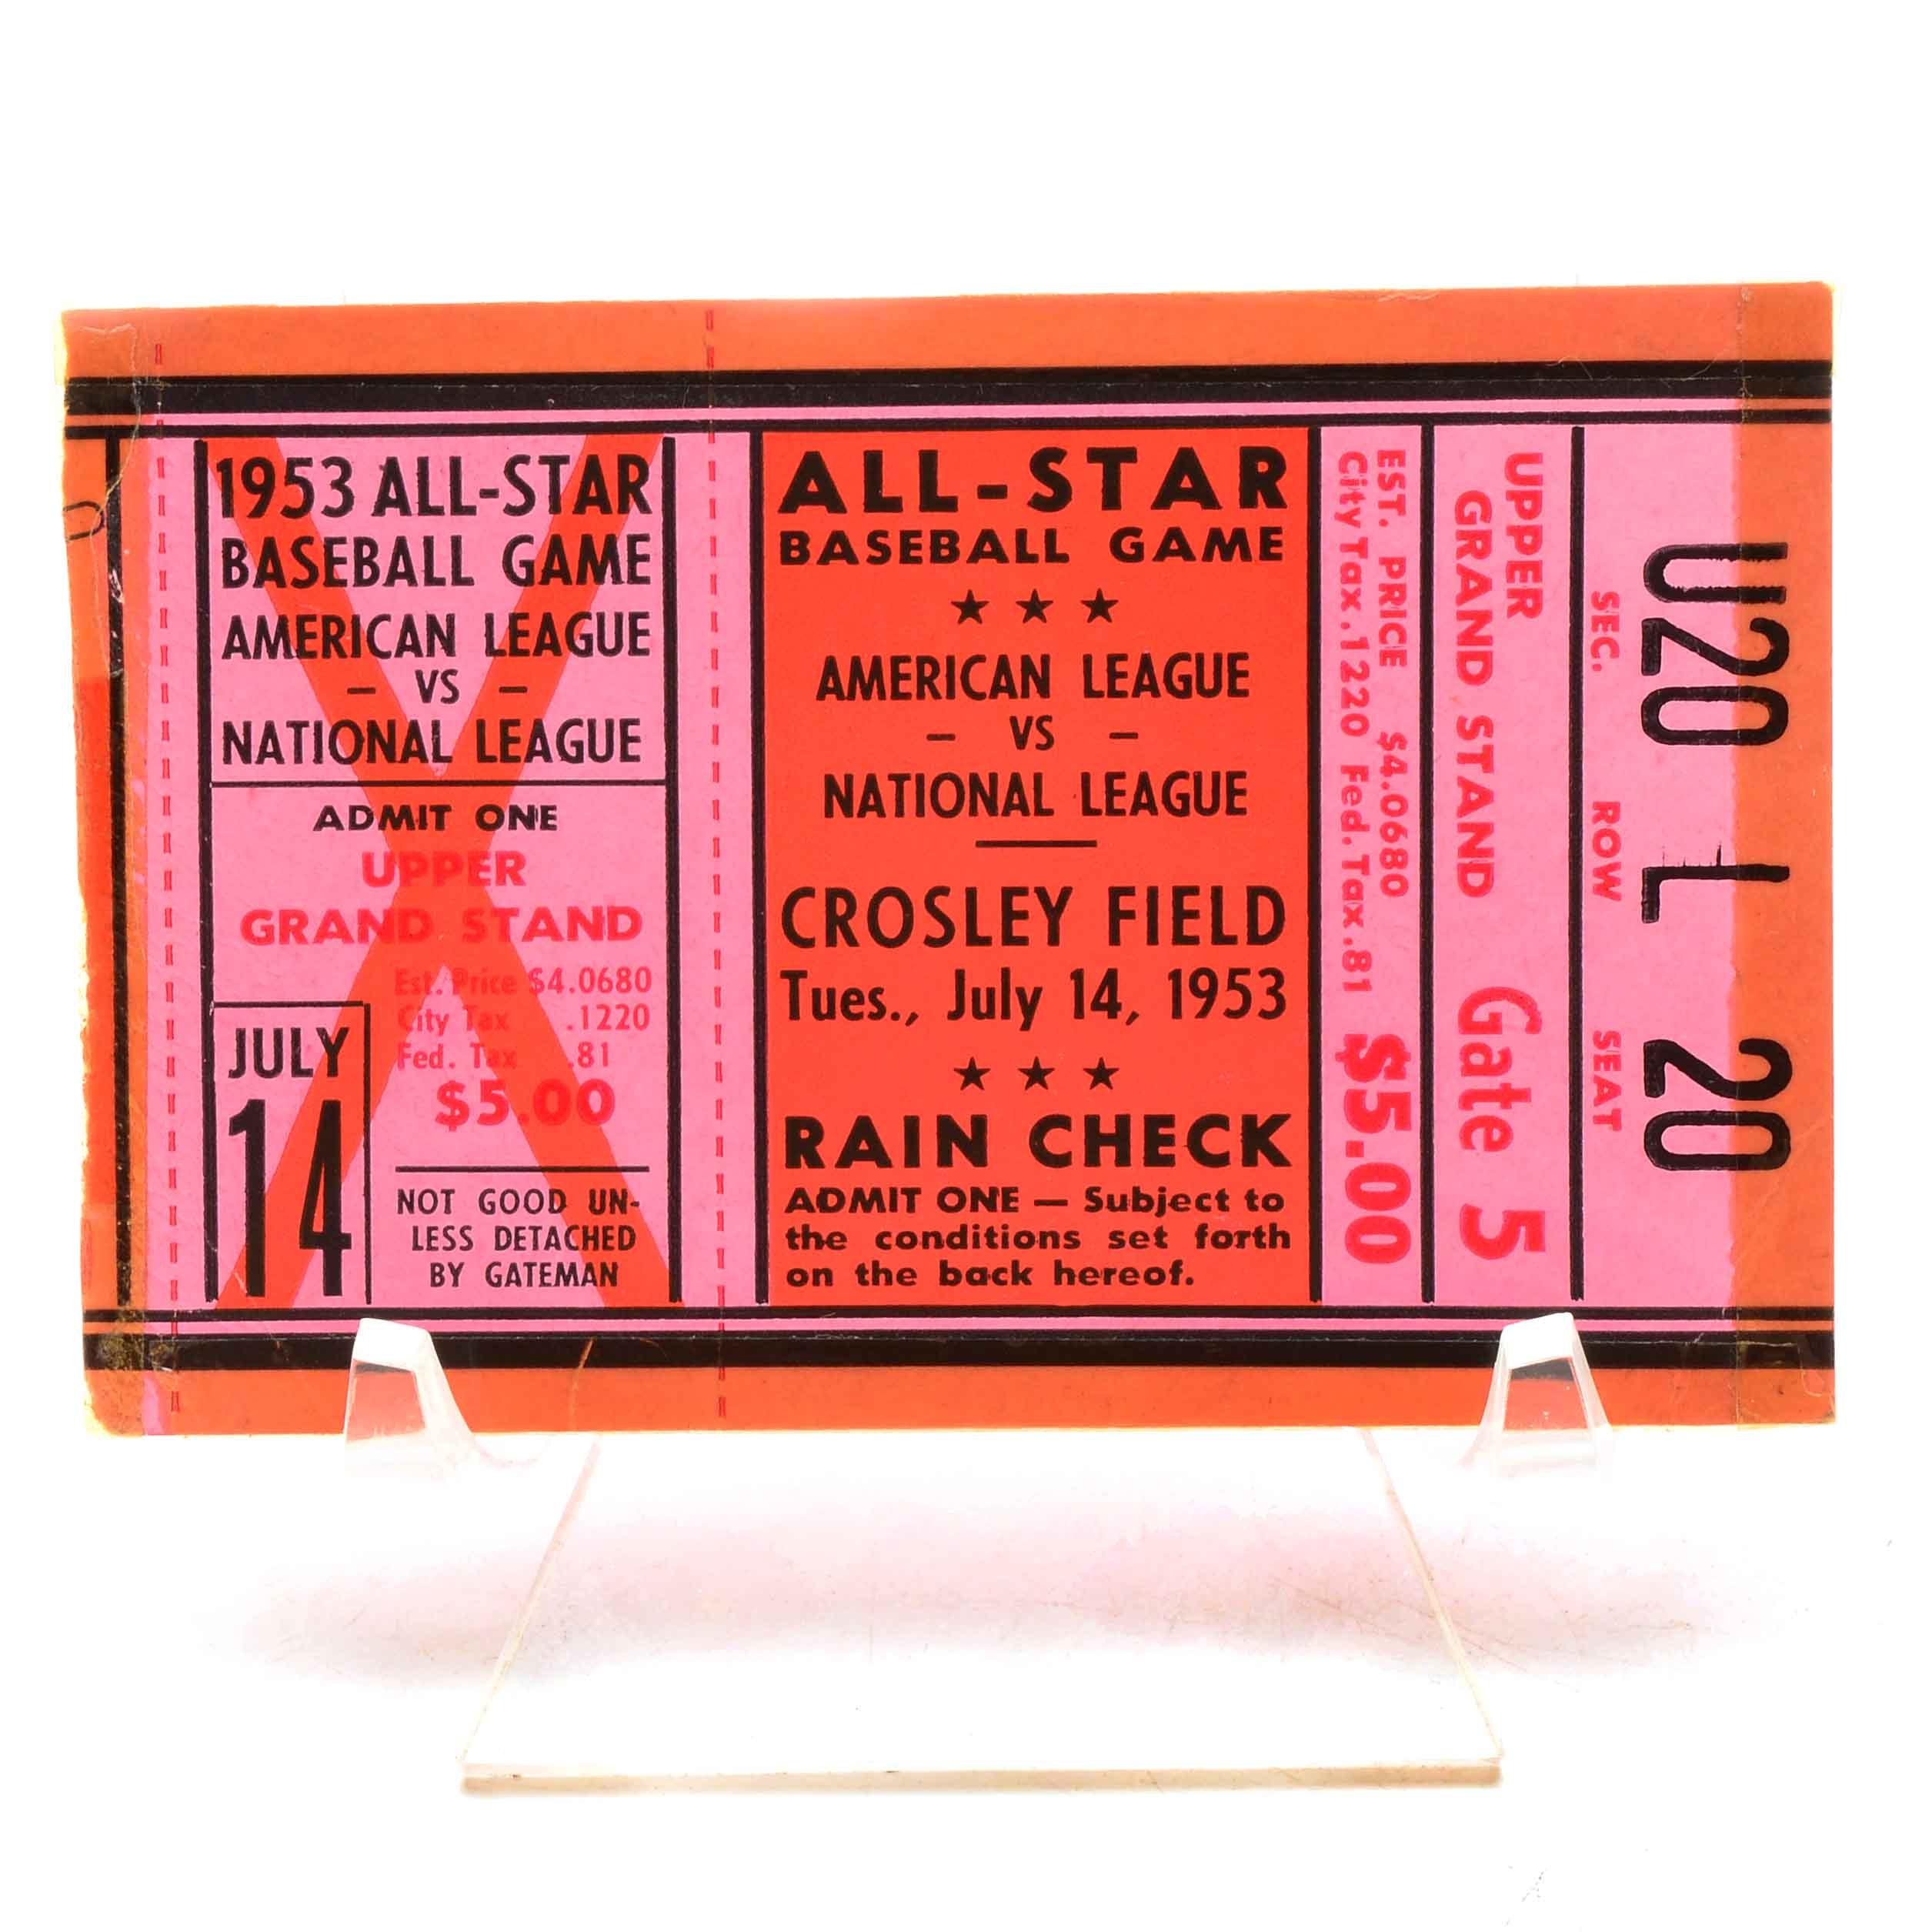 1953 All-Star Game Baseball Ticket Crosley Field